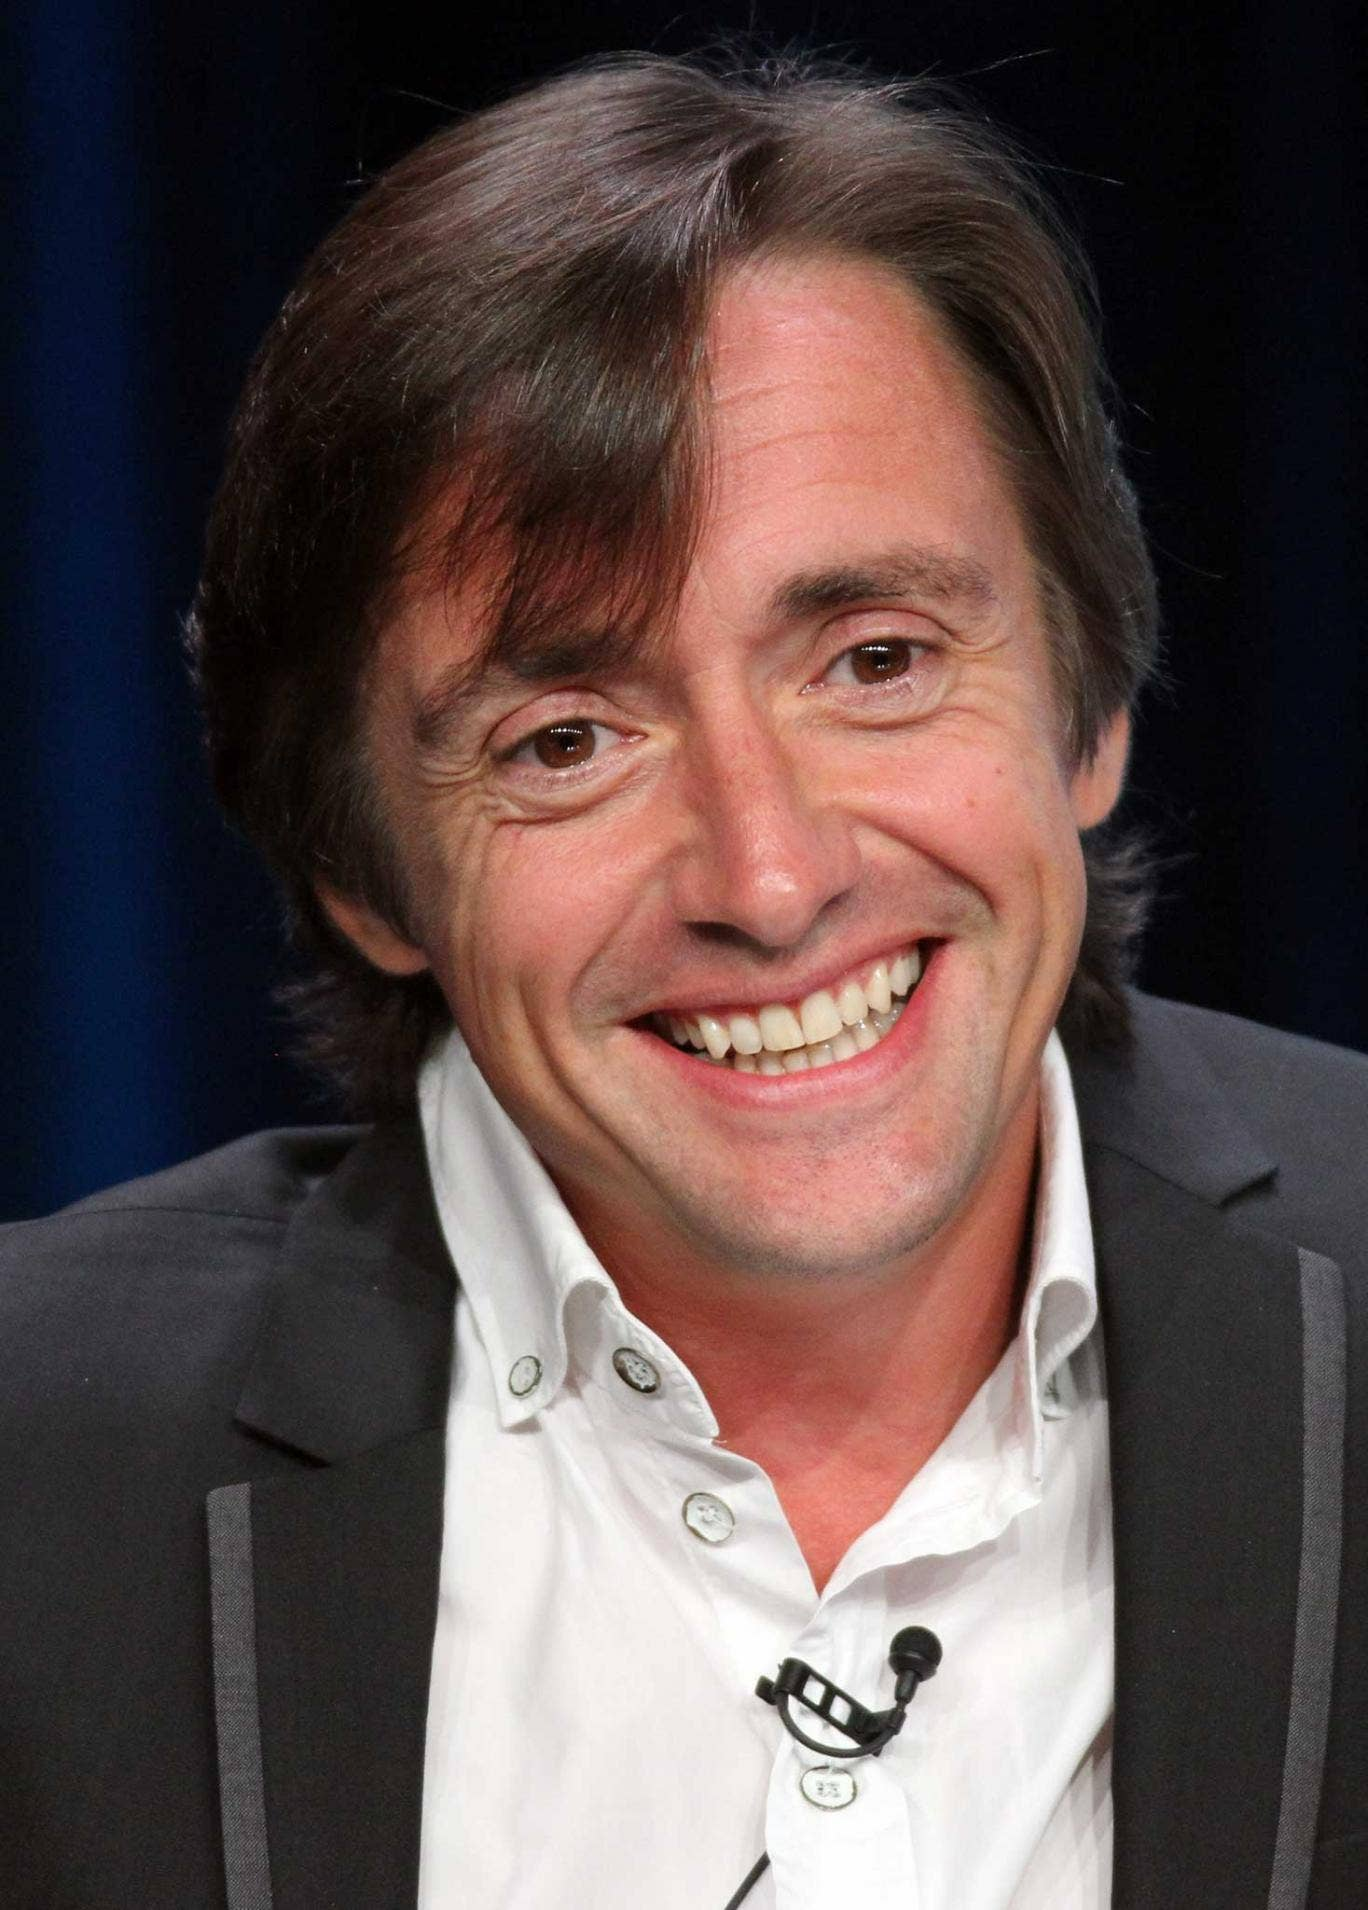 Hammond says: 'There are many things I wish I had never worn...I'm hardly renowned for my dress sense.'